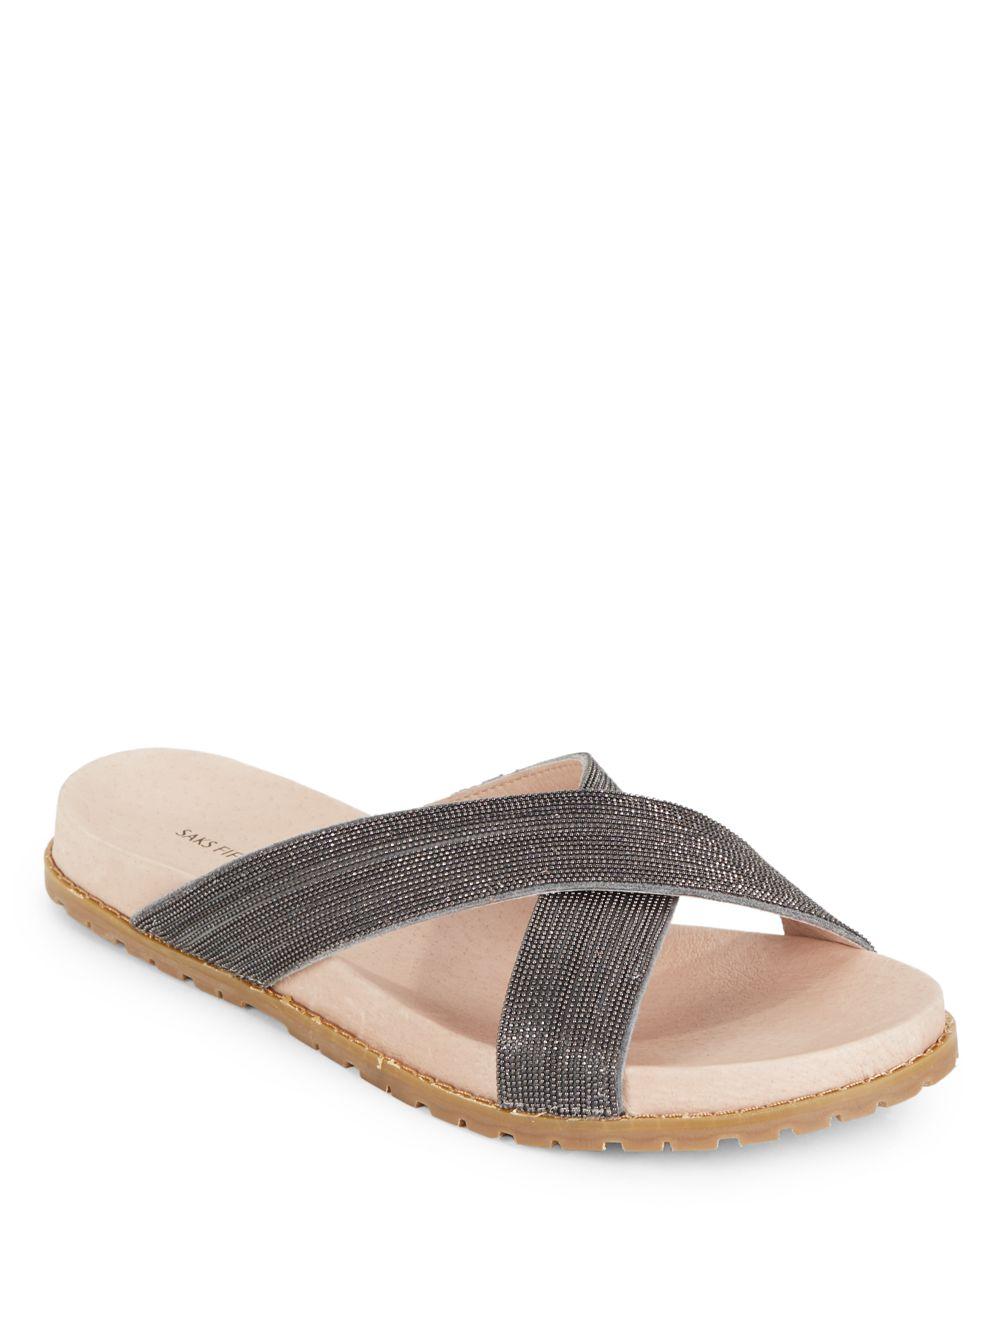 saks fifth avenue daylight slide sandals in black lyst